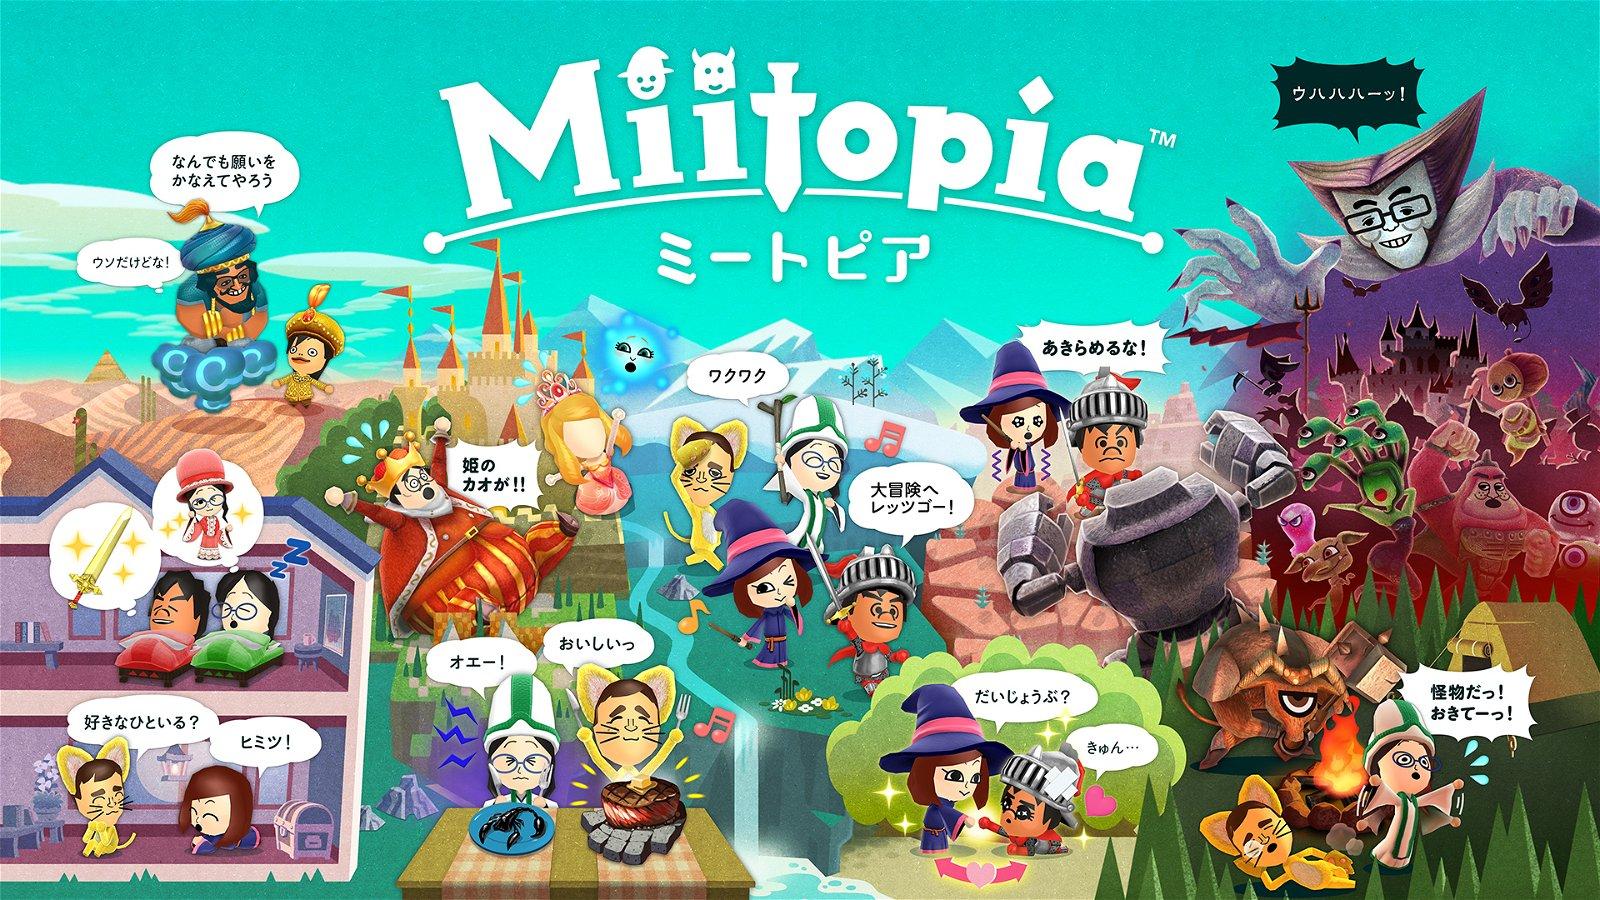 Miitopia (Nintendo 3DS) Review - First Class Friendship